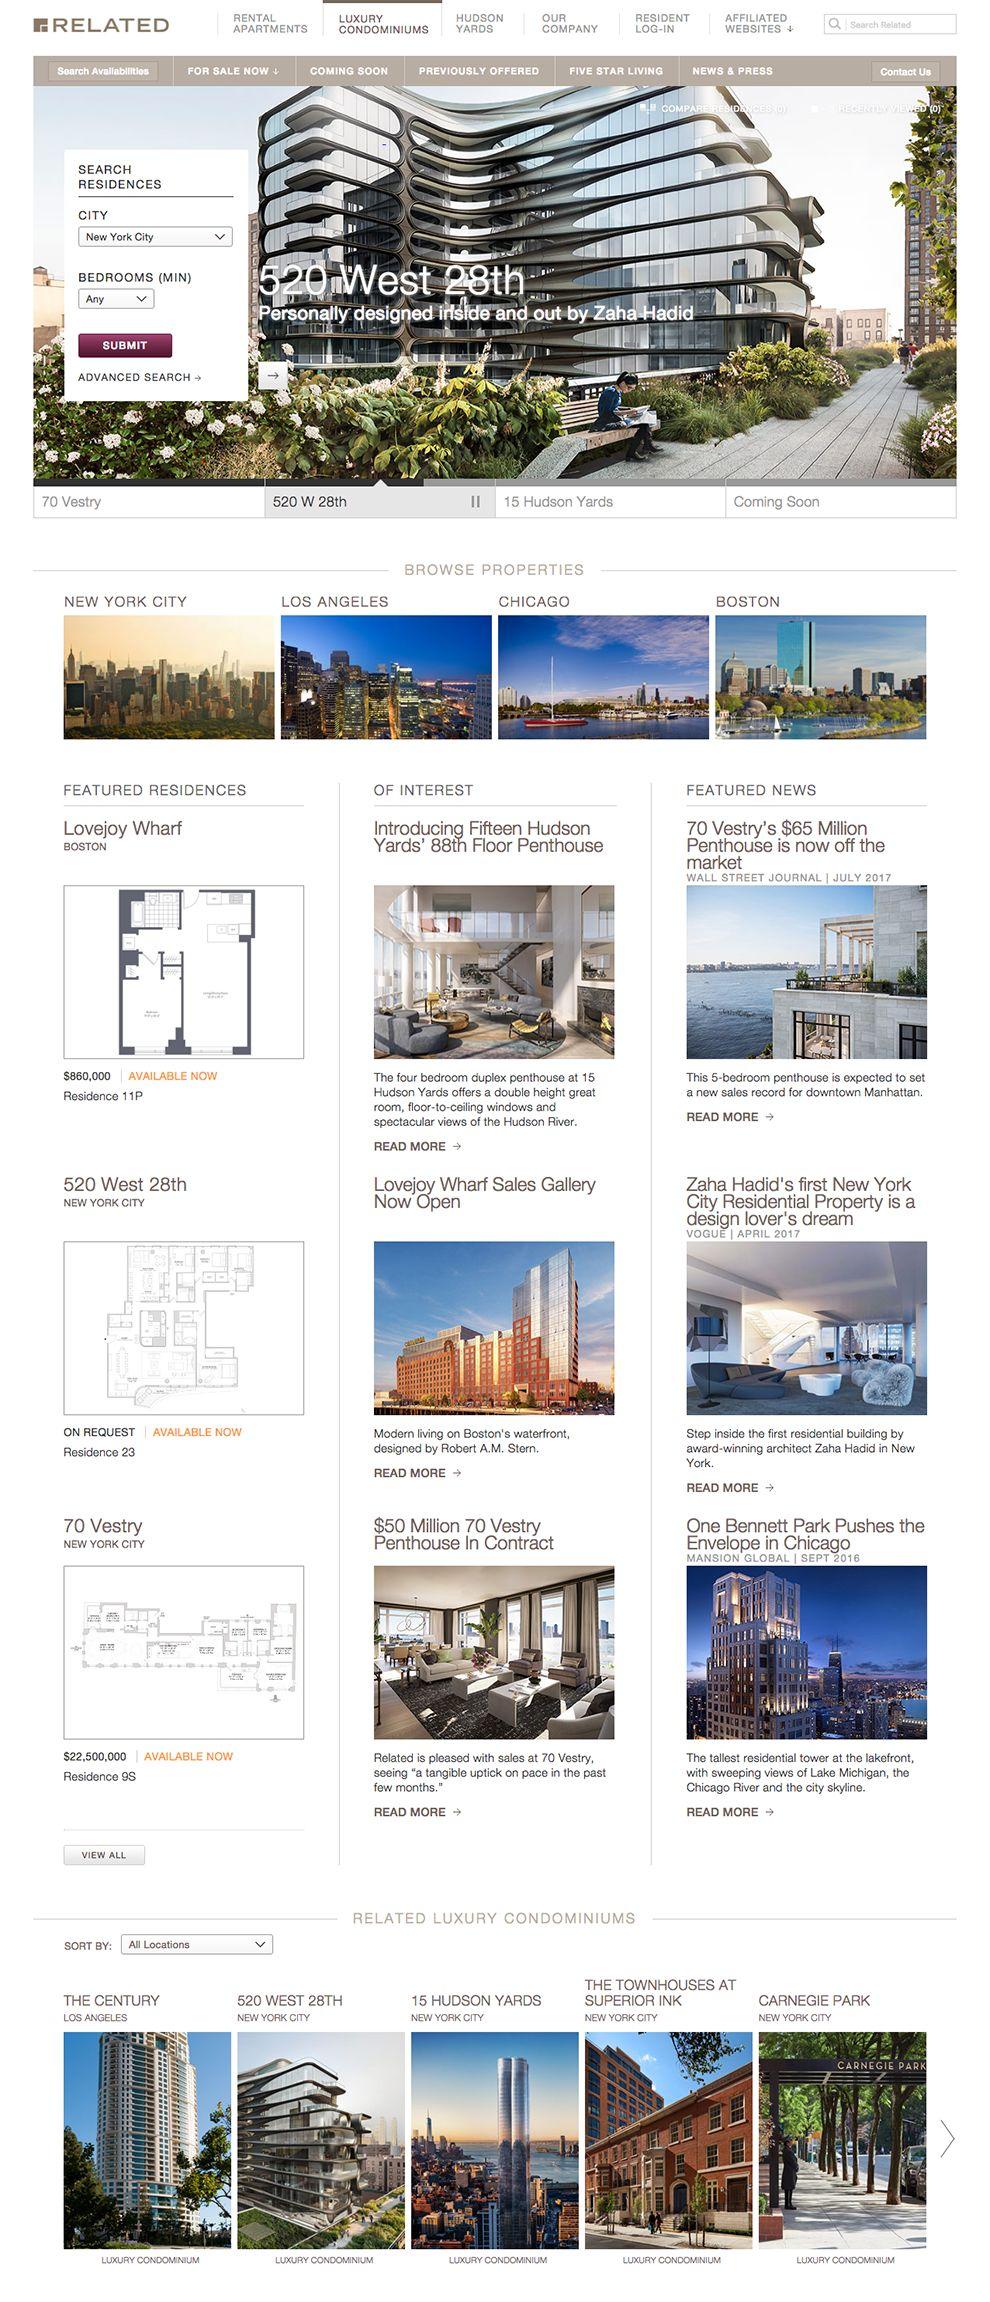 Related Sales Great Website Design Homepage